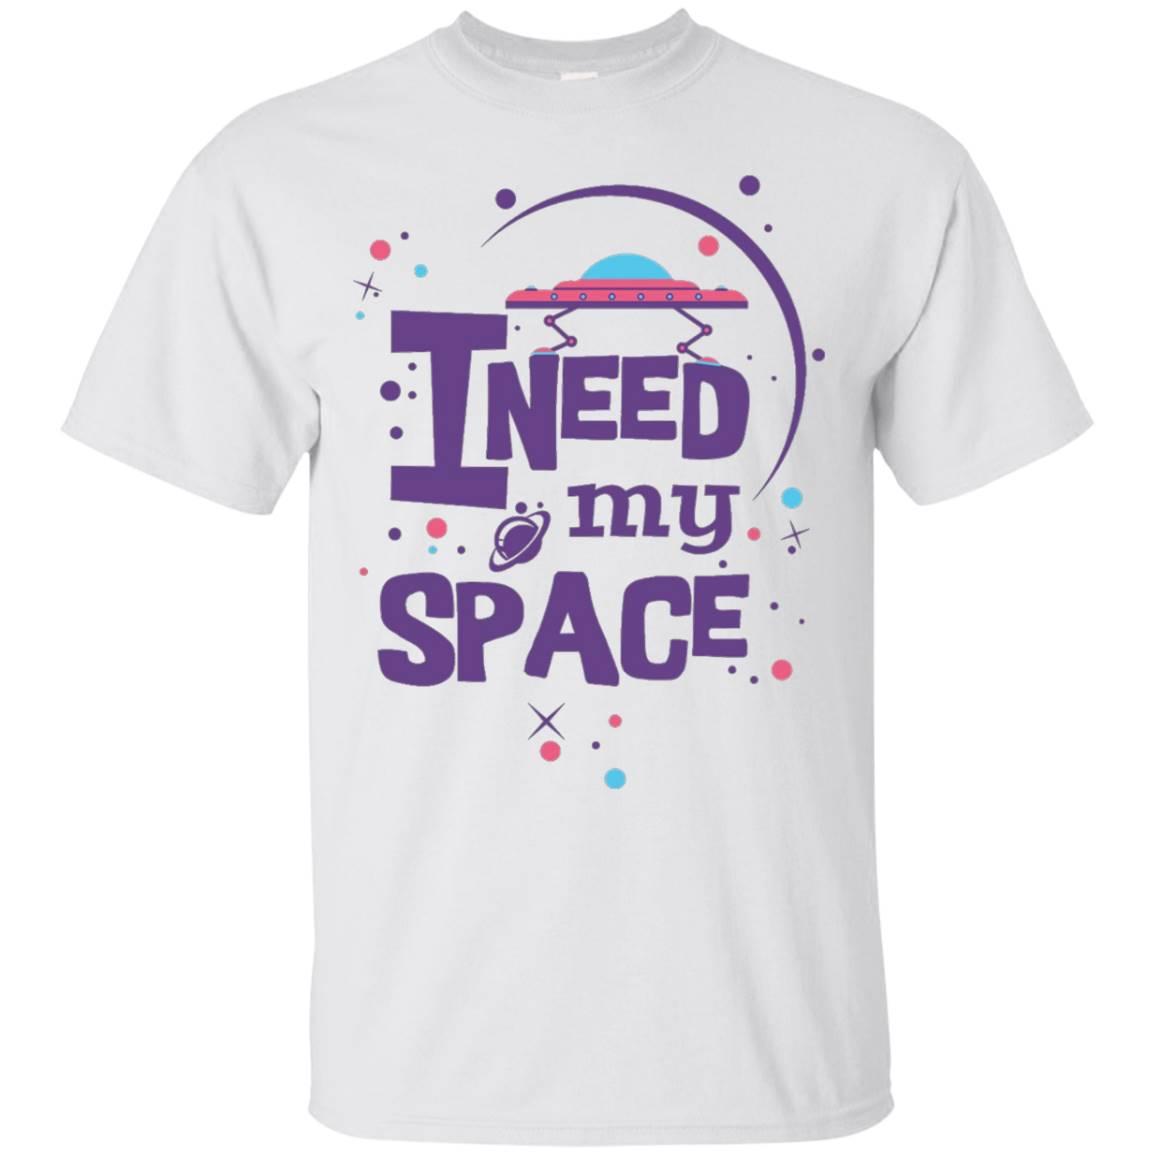 Nasa I Need T Shirt My Space